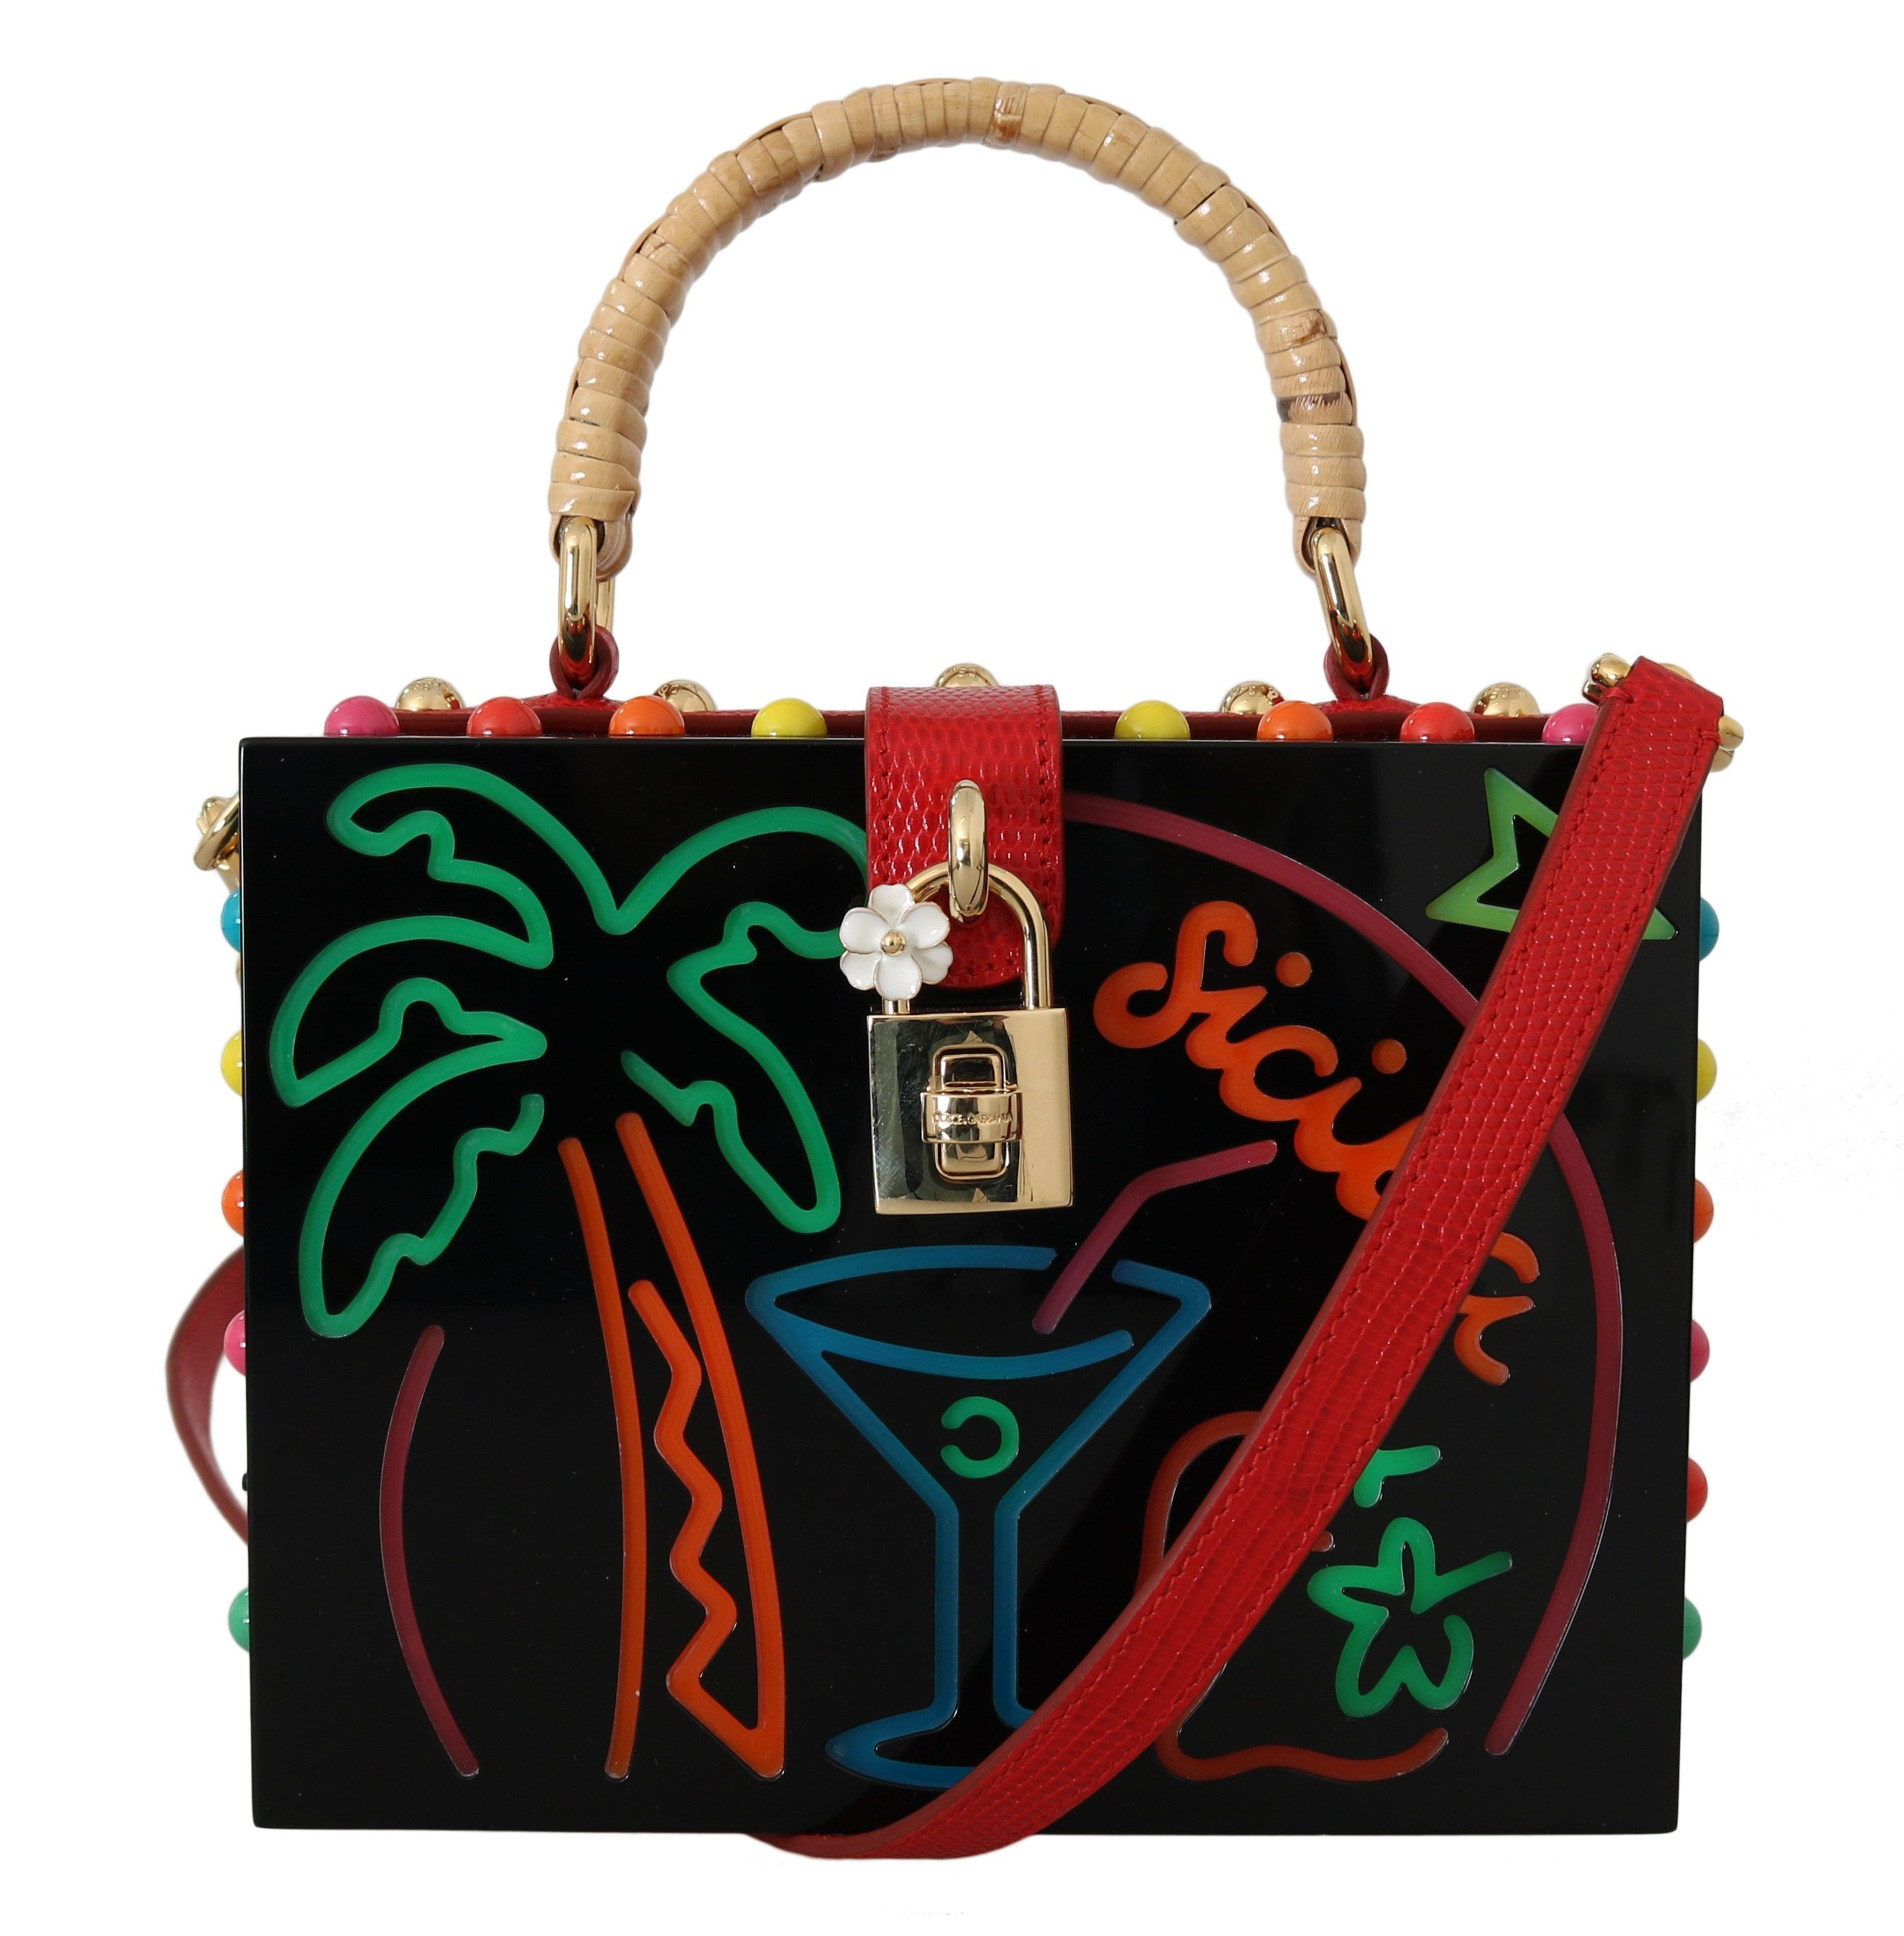 Dolce & Gabbana Black Plexi LED Light Leather SICILY BARP BOX Purse